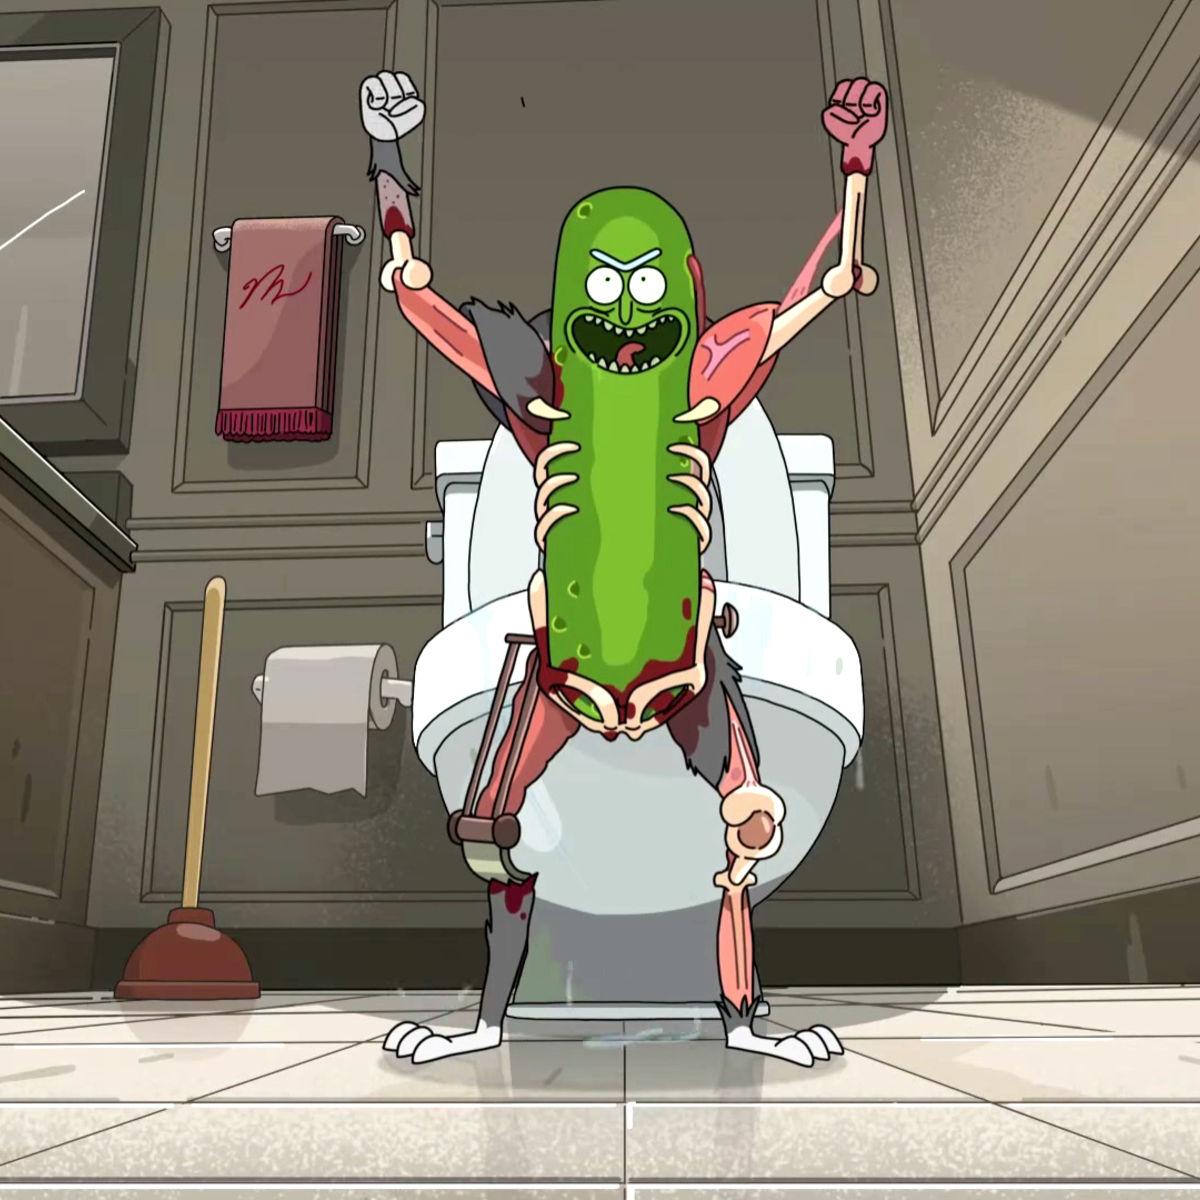 pickle-rick-rick-and-mortyjpg.jpeg